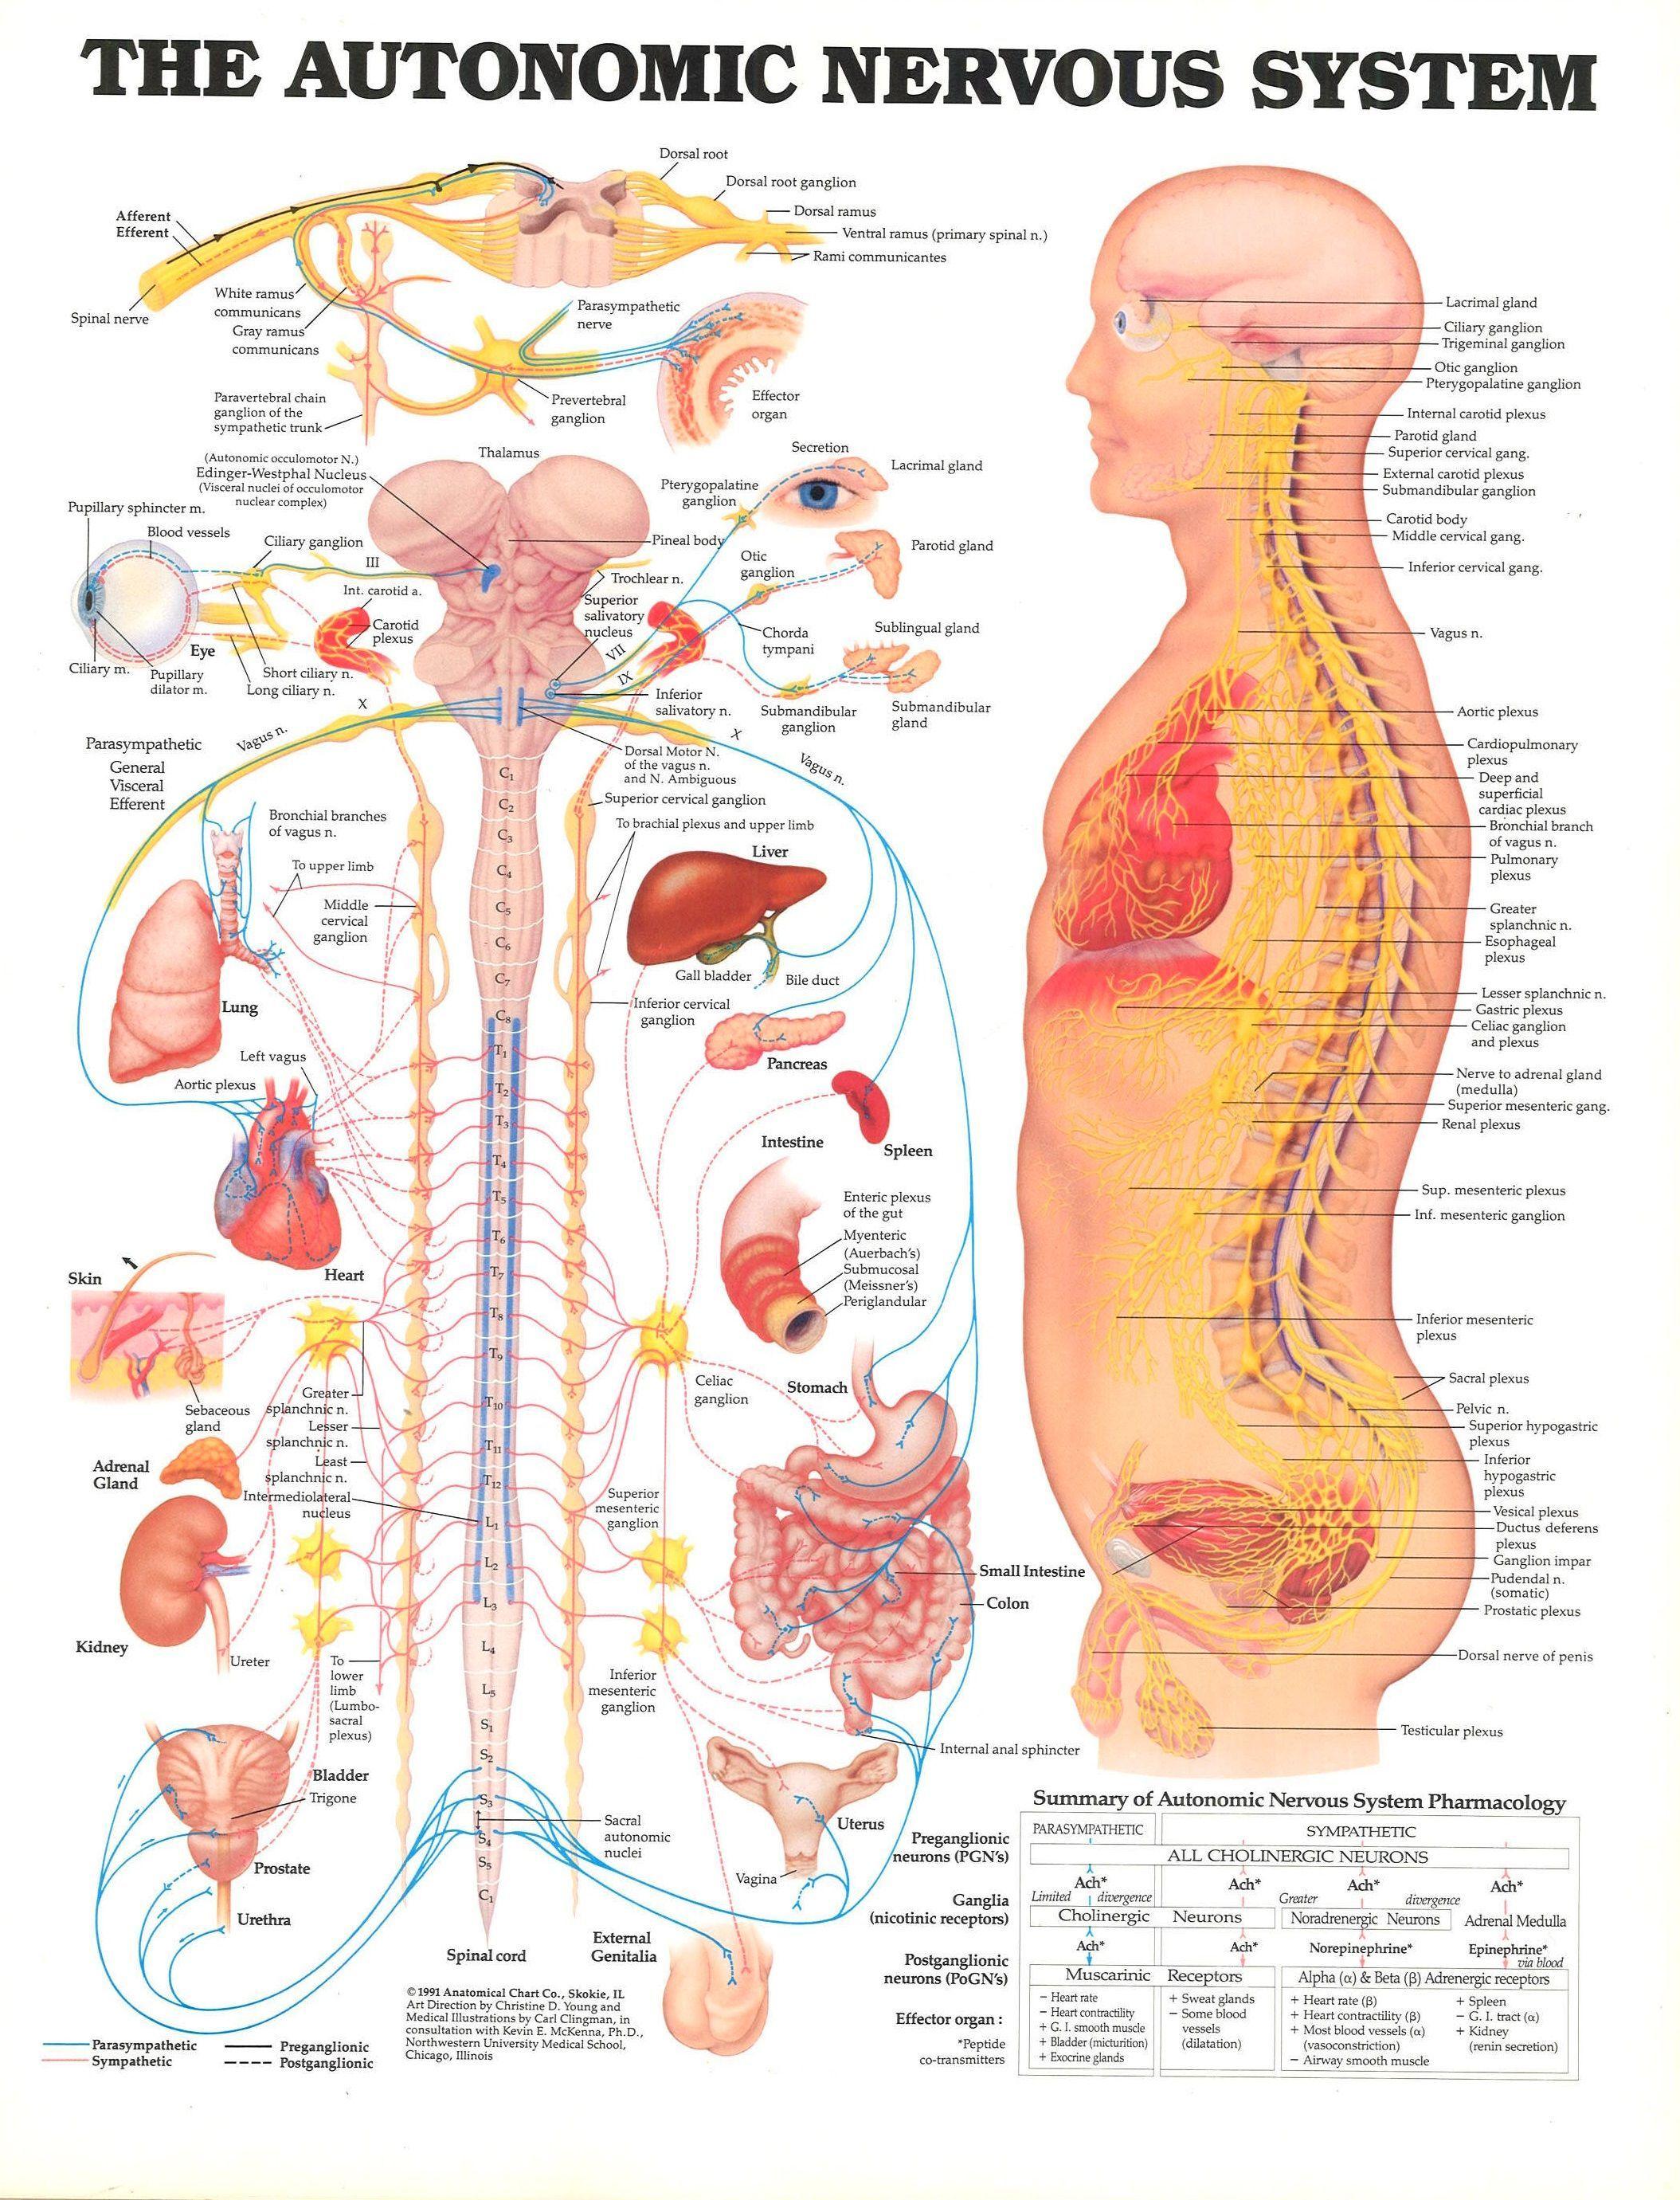 nervous system anatomy nervous system anatomy the autonomic nervous system the autonomic nervous system [ 2109 x 2761 Pixel ]